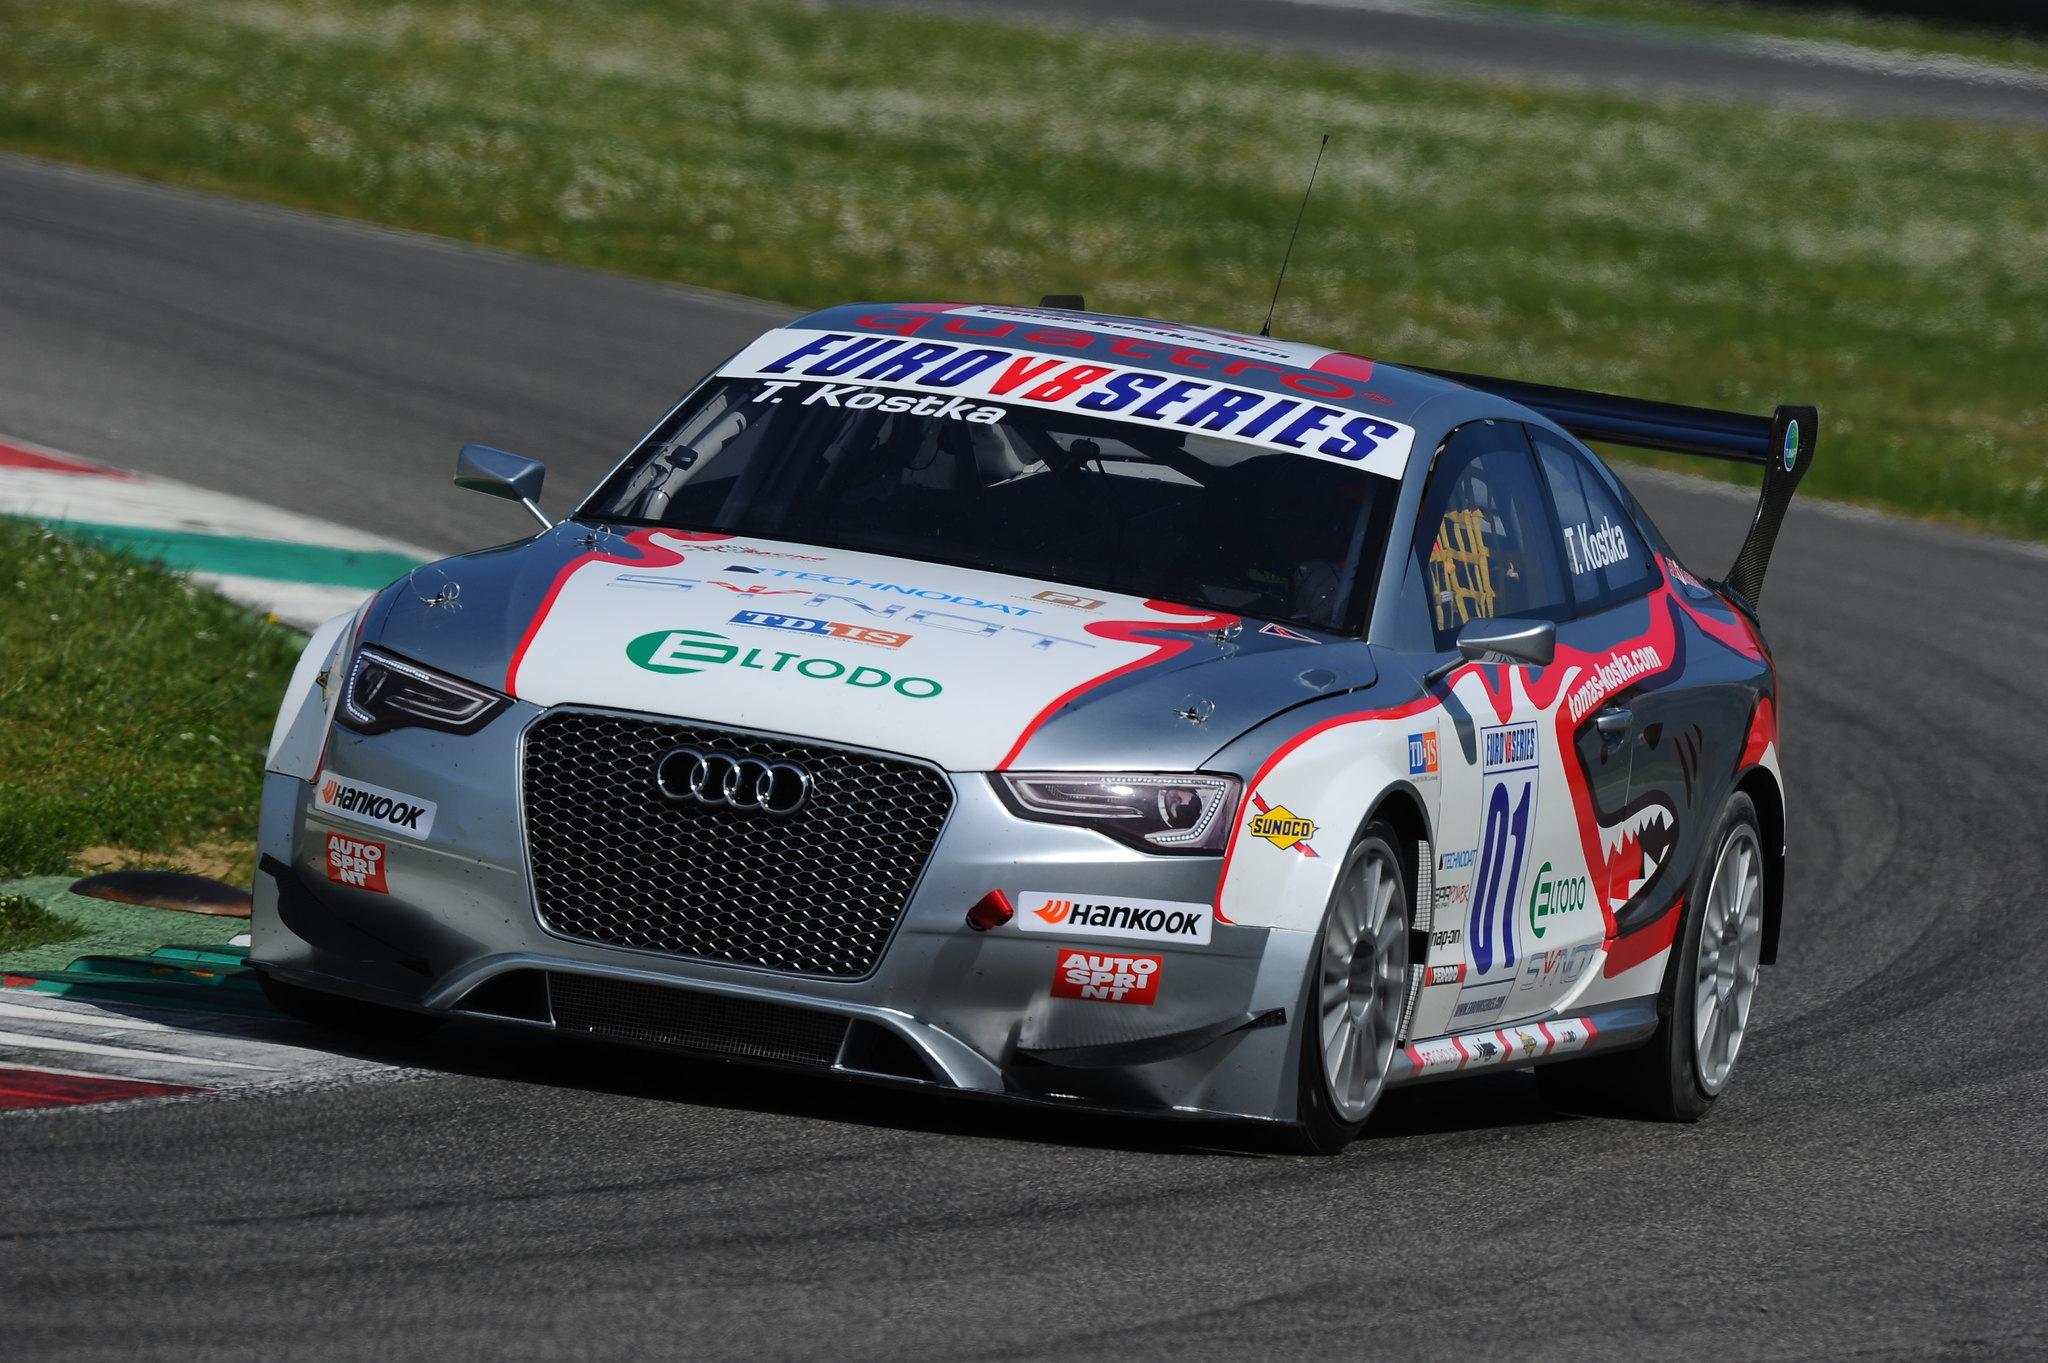 Poll Best Privateer Audi Race Car In 2014 Audi